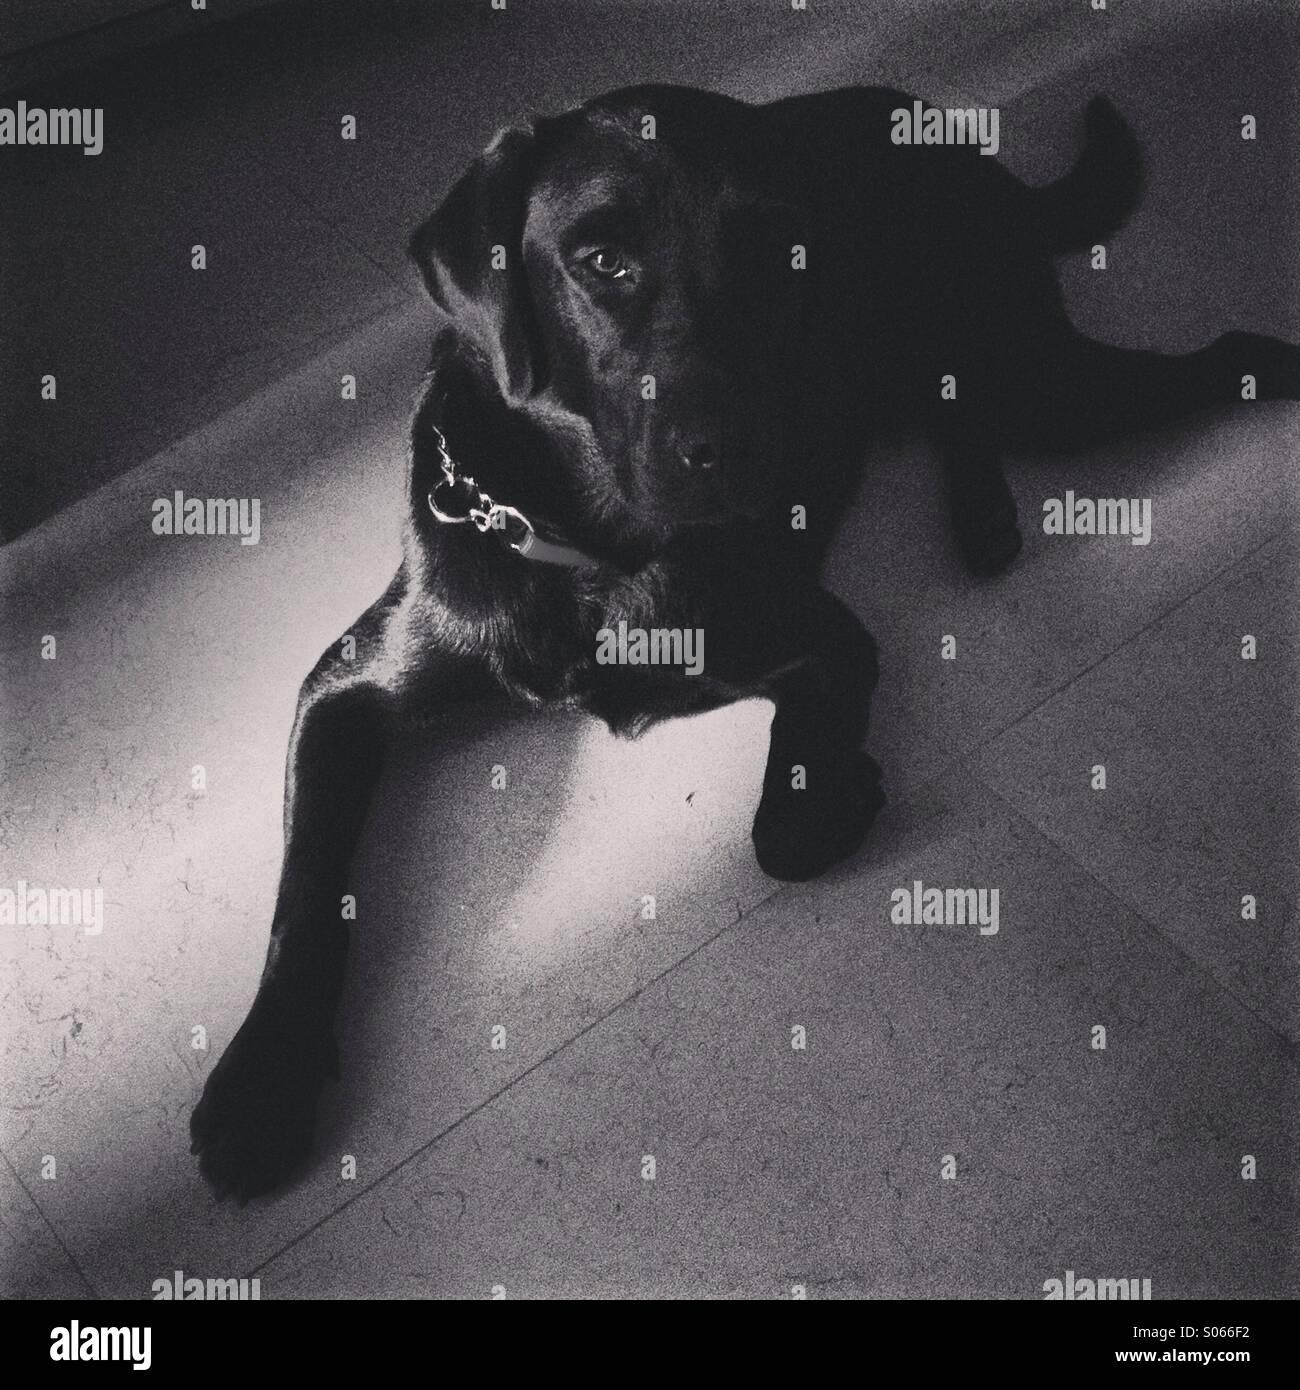 Black Dog Labrador Retriever looking at camera Photo Stock